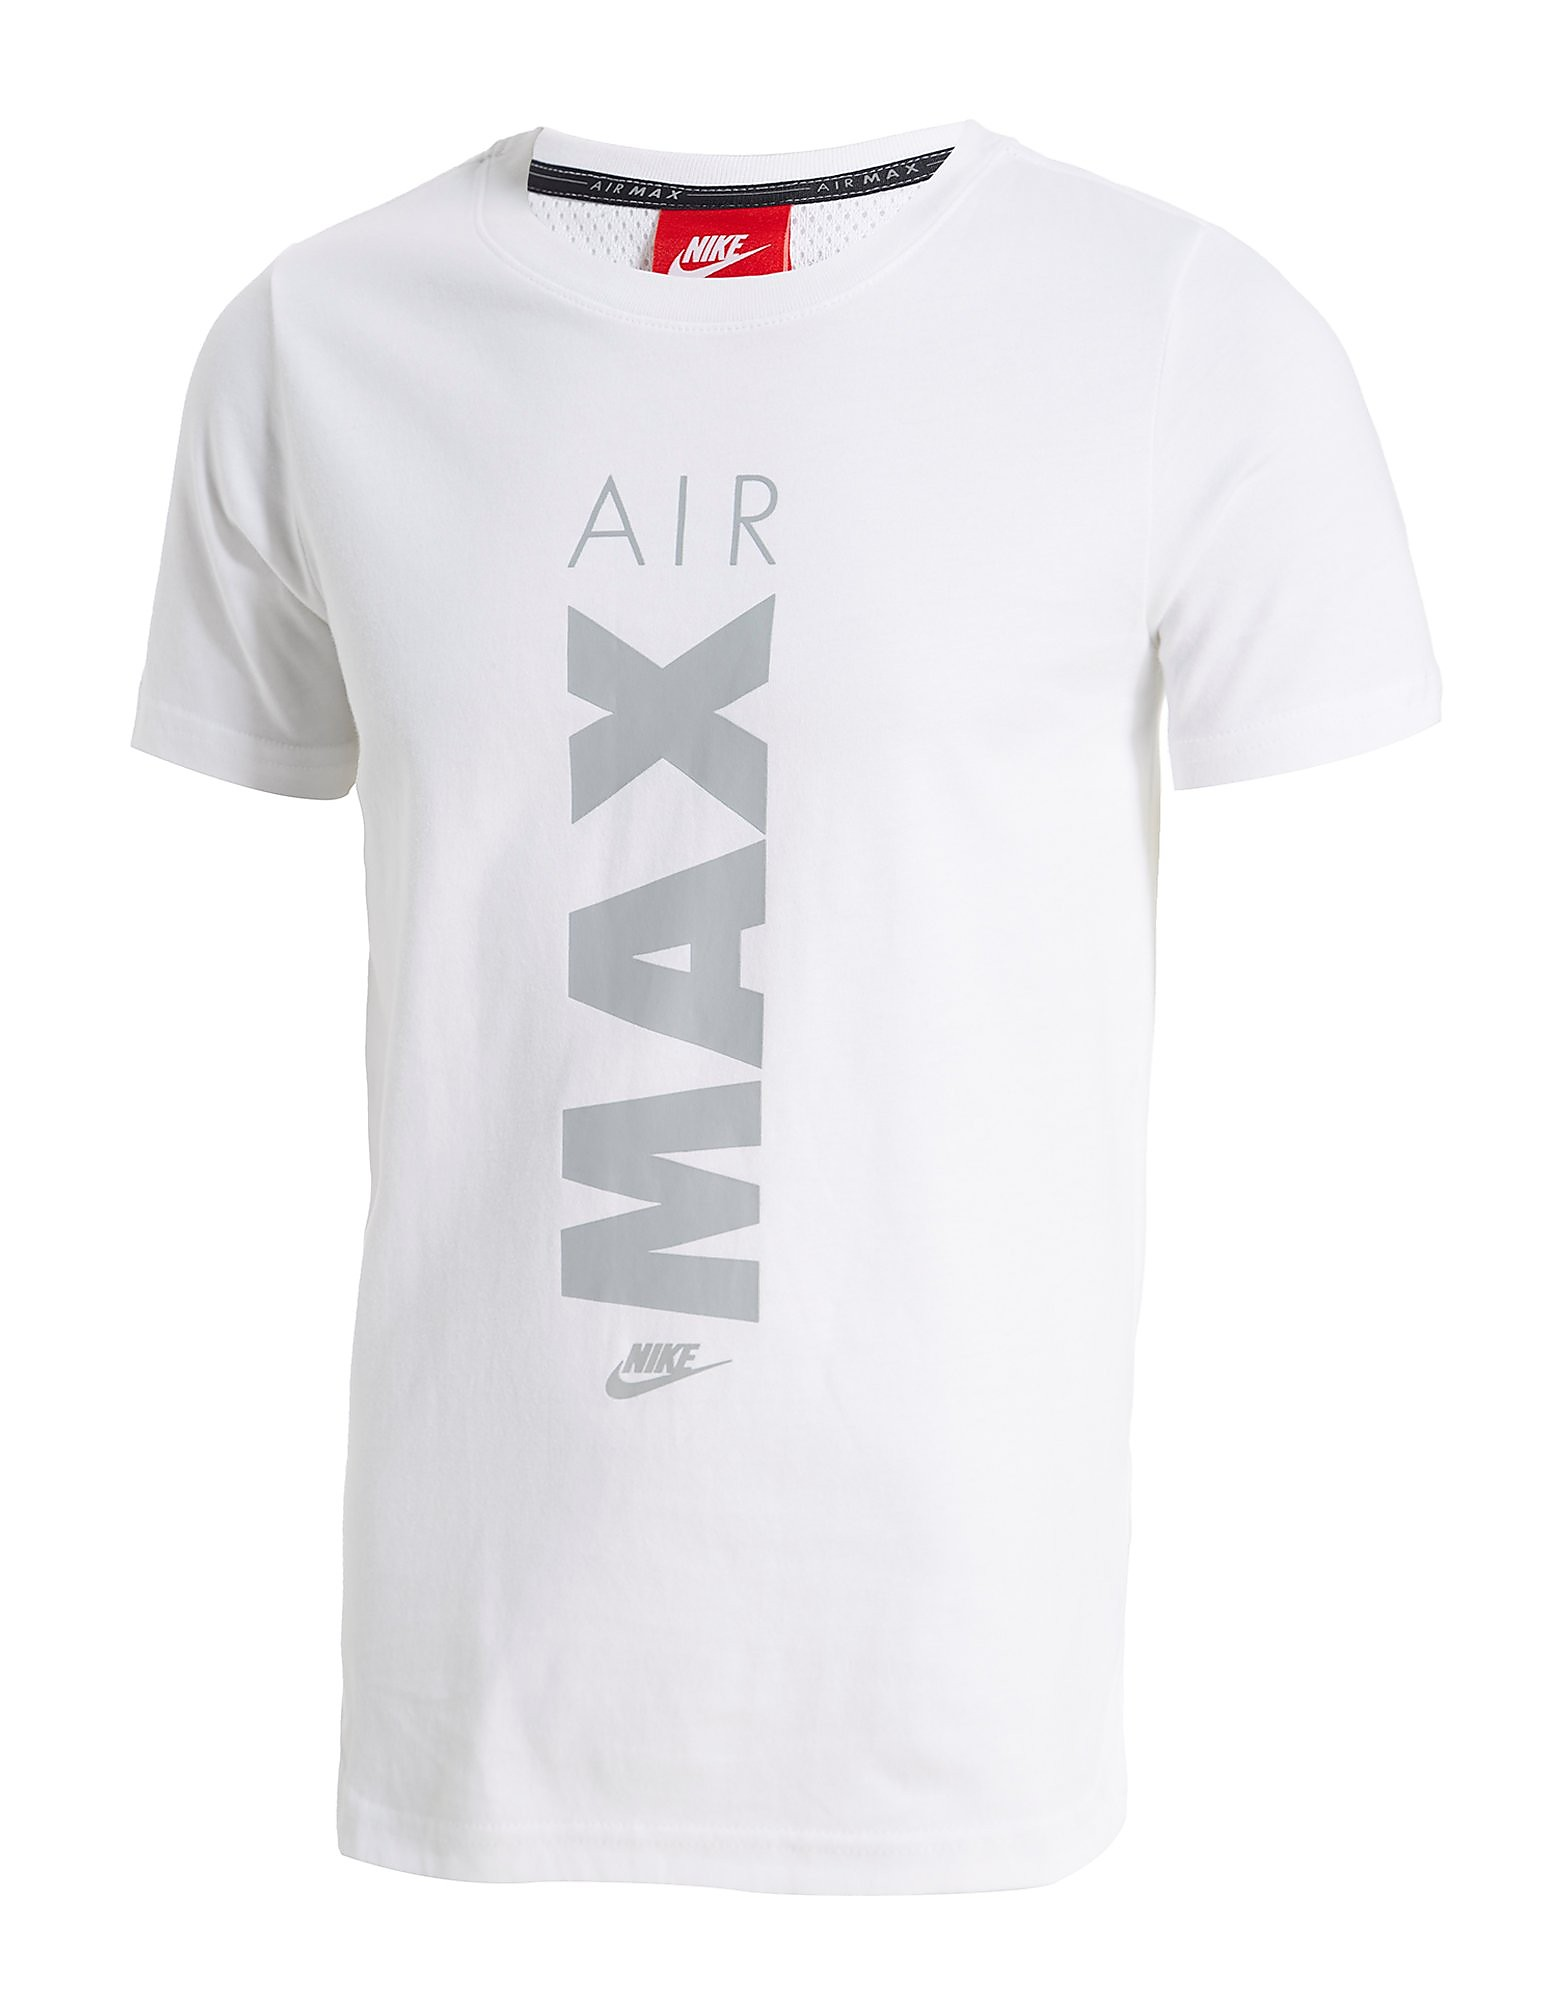 Nike T-shirt Air Max junior